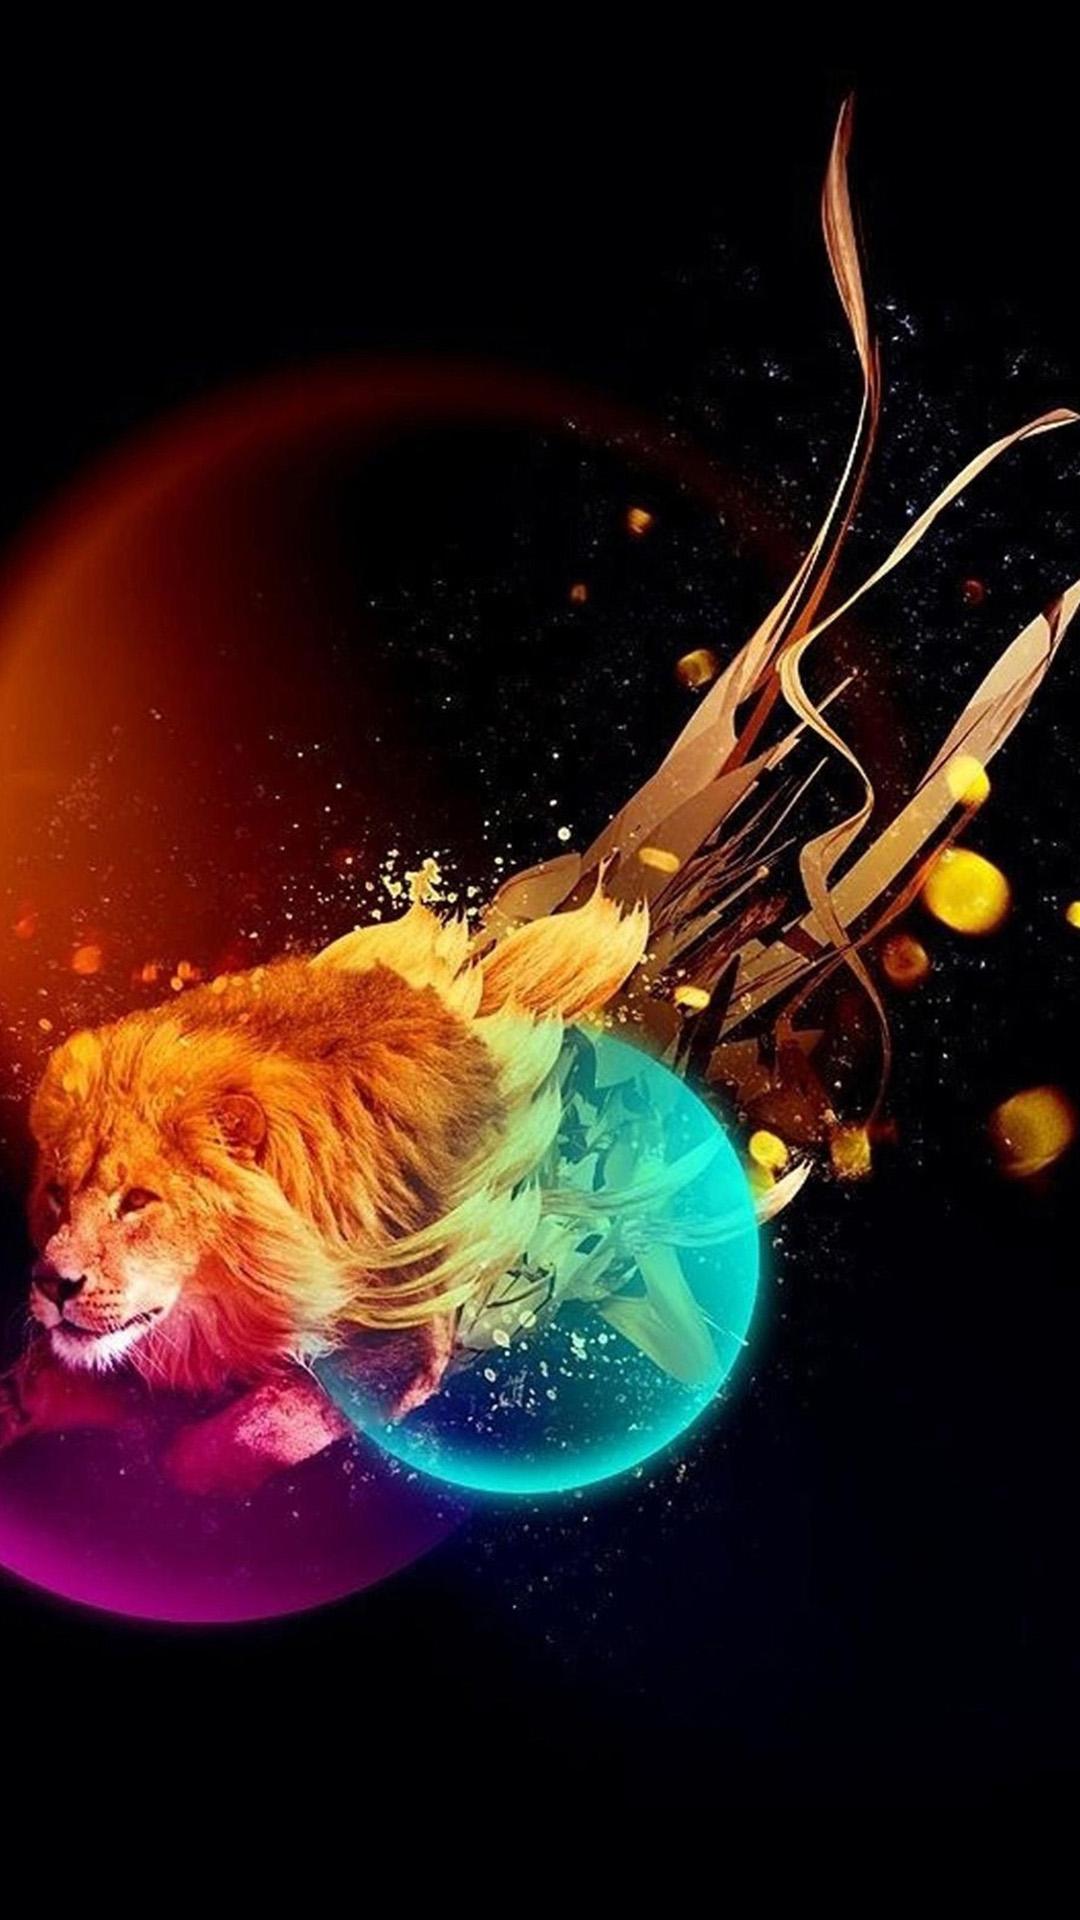 Colorful lion wallpaper wallpapersafari - Car wallpapers for galaxy s5 ...